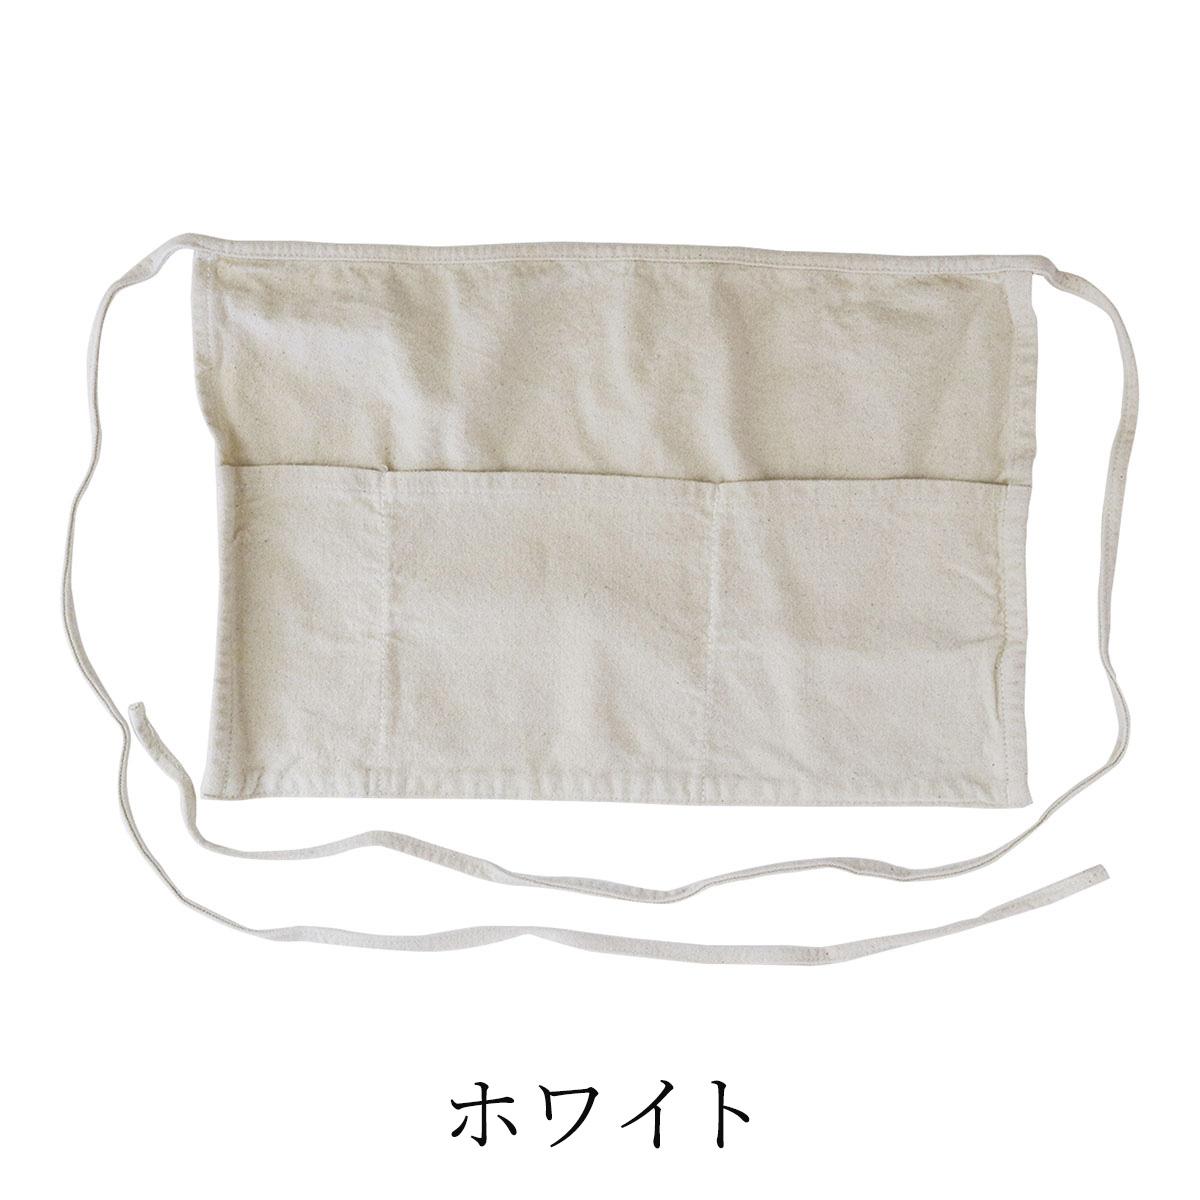 【MAKEUP】倉敷帆布 製品染め カフェエプロン 8カラー